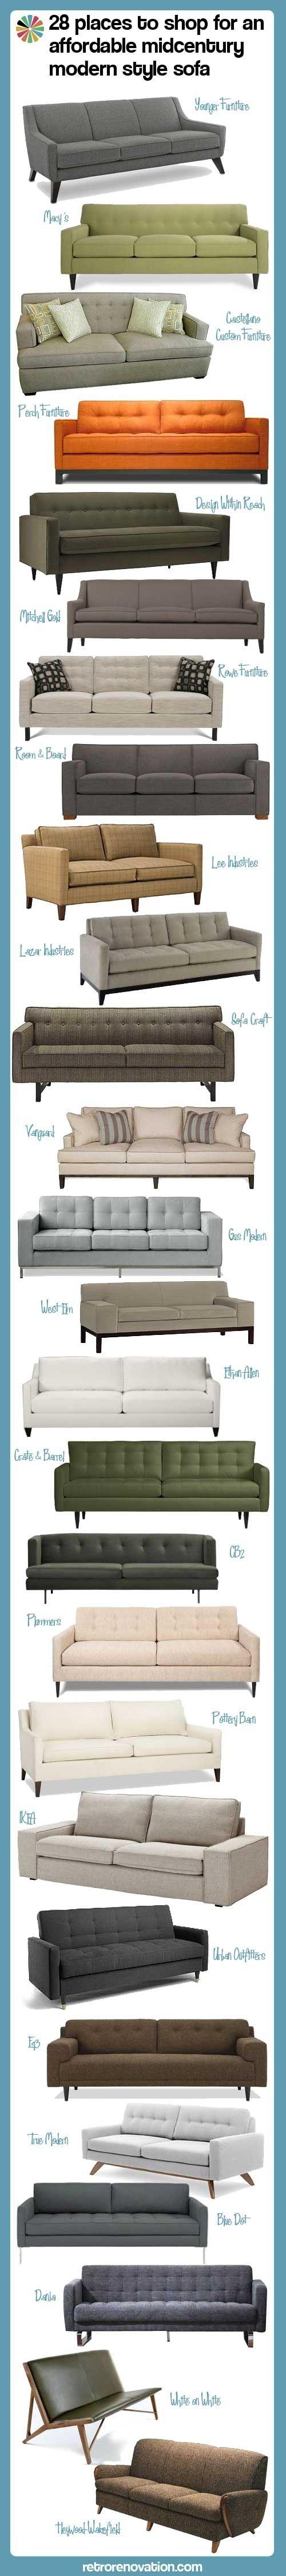 28 affordable mid century modern sofas — Retro Renovation